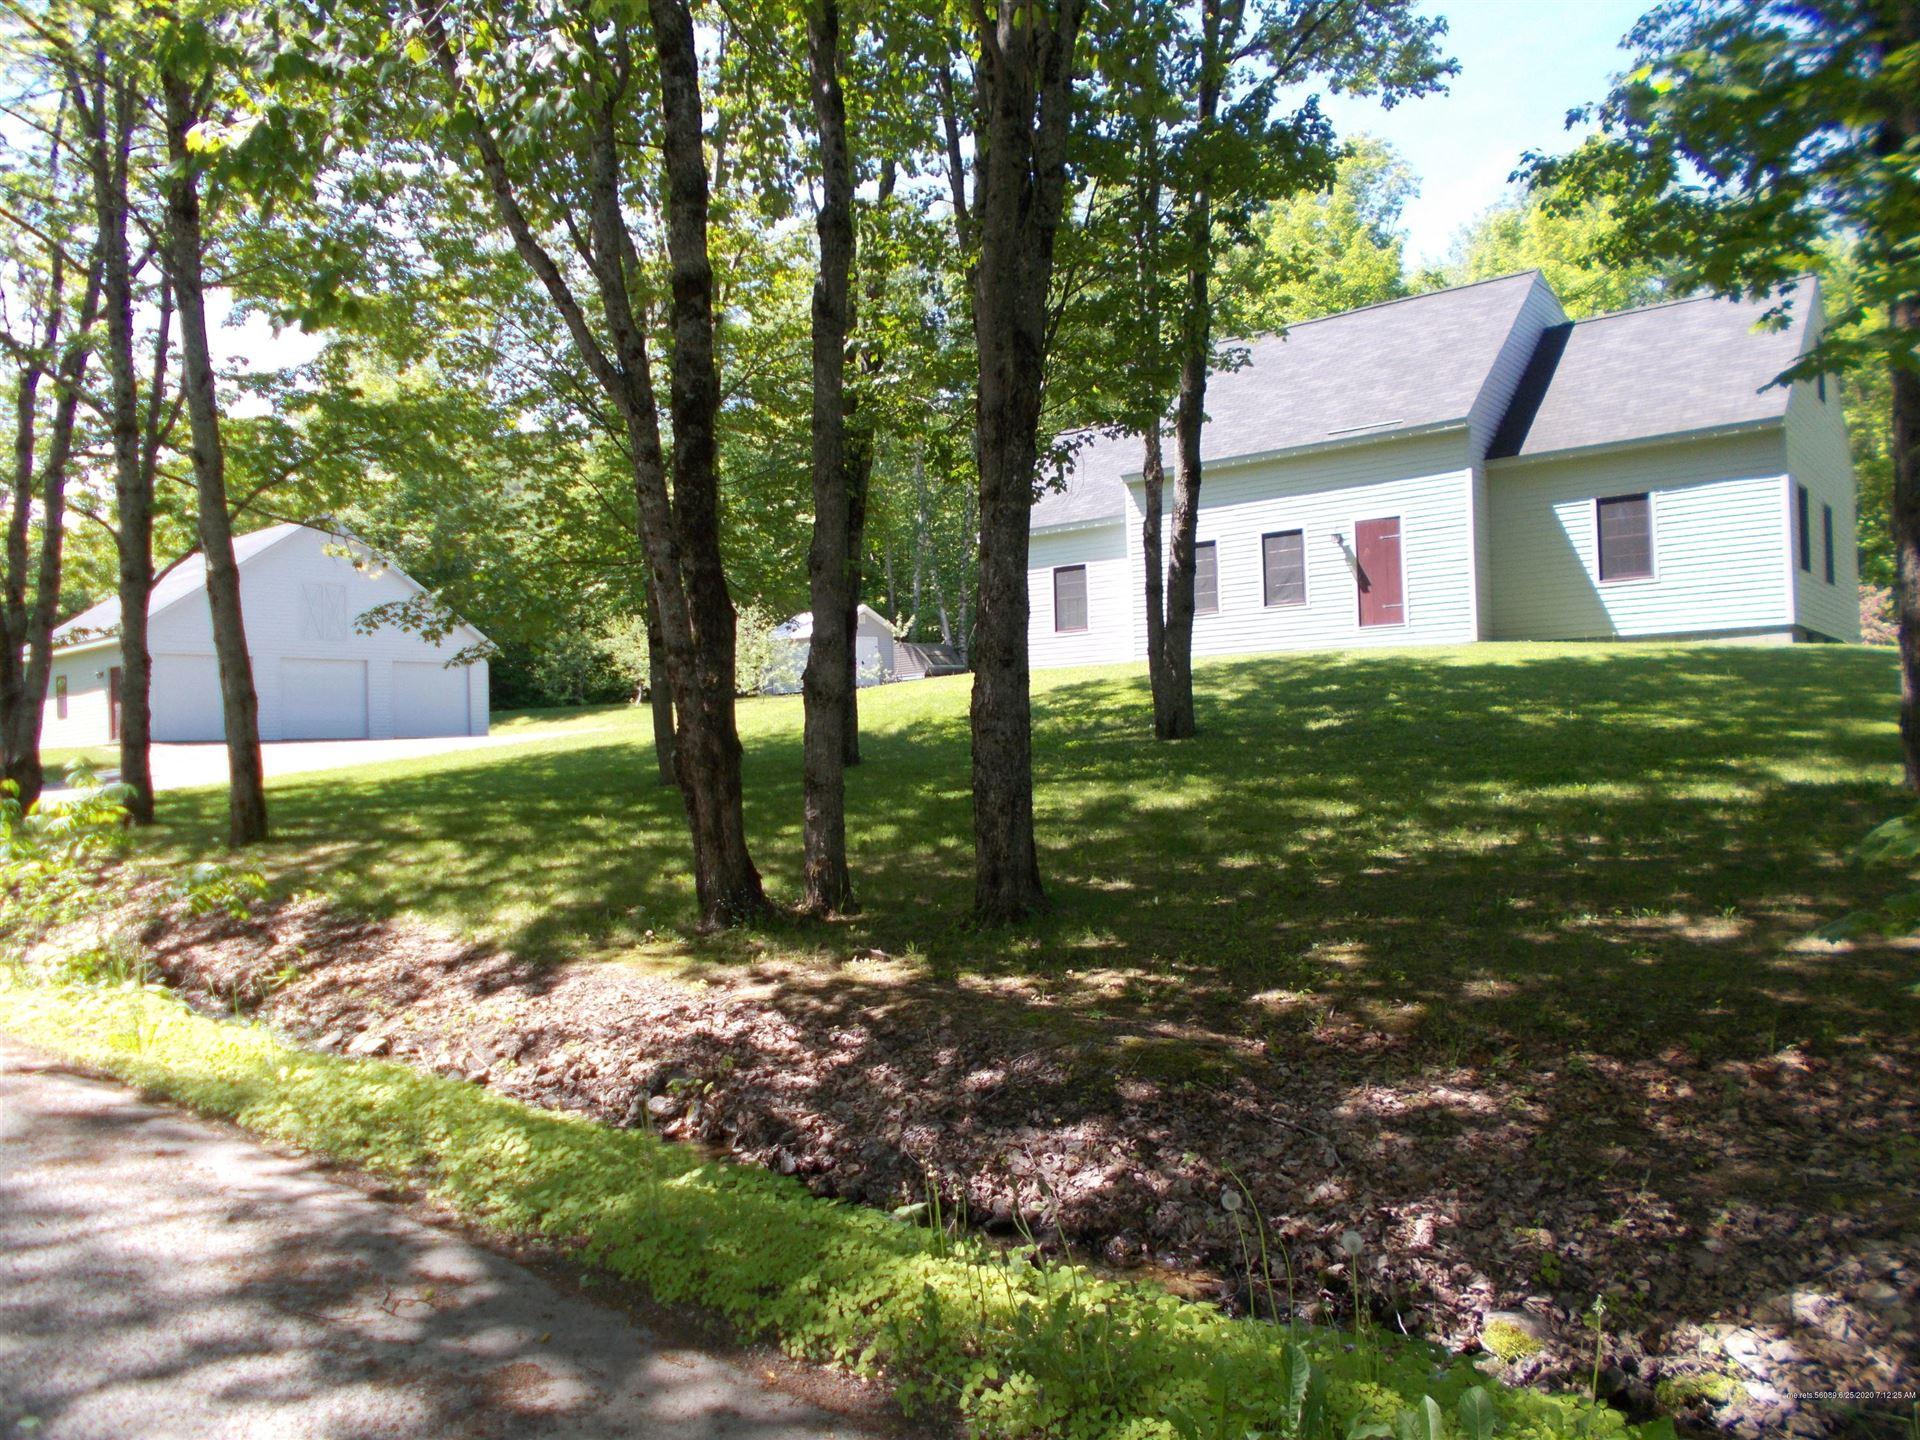 Photo of 27 Lakeshore Drive, Presque Isle, ME 04769 (MLS # 1457651)